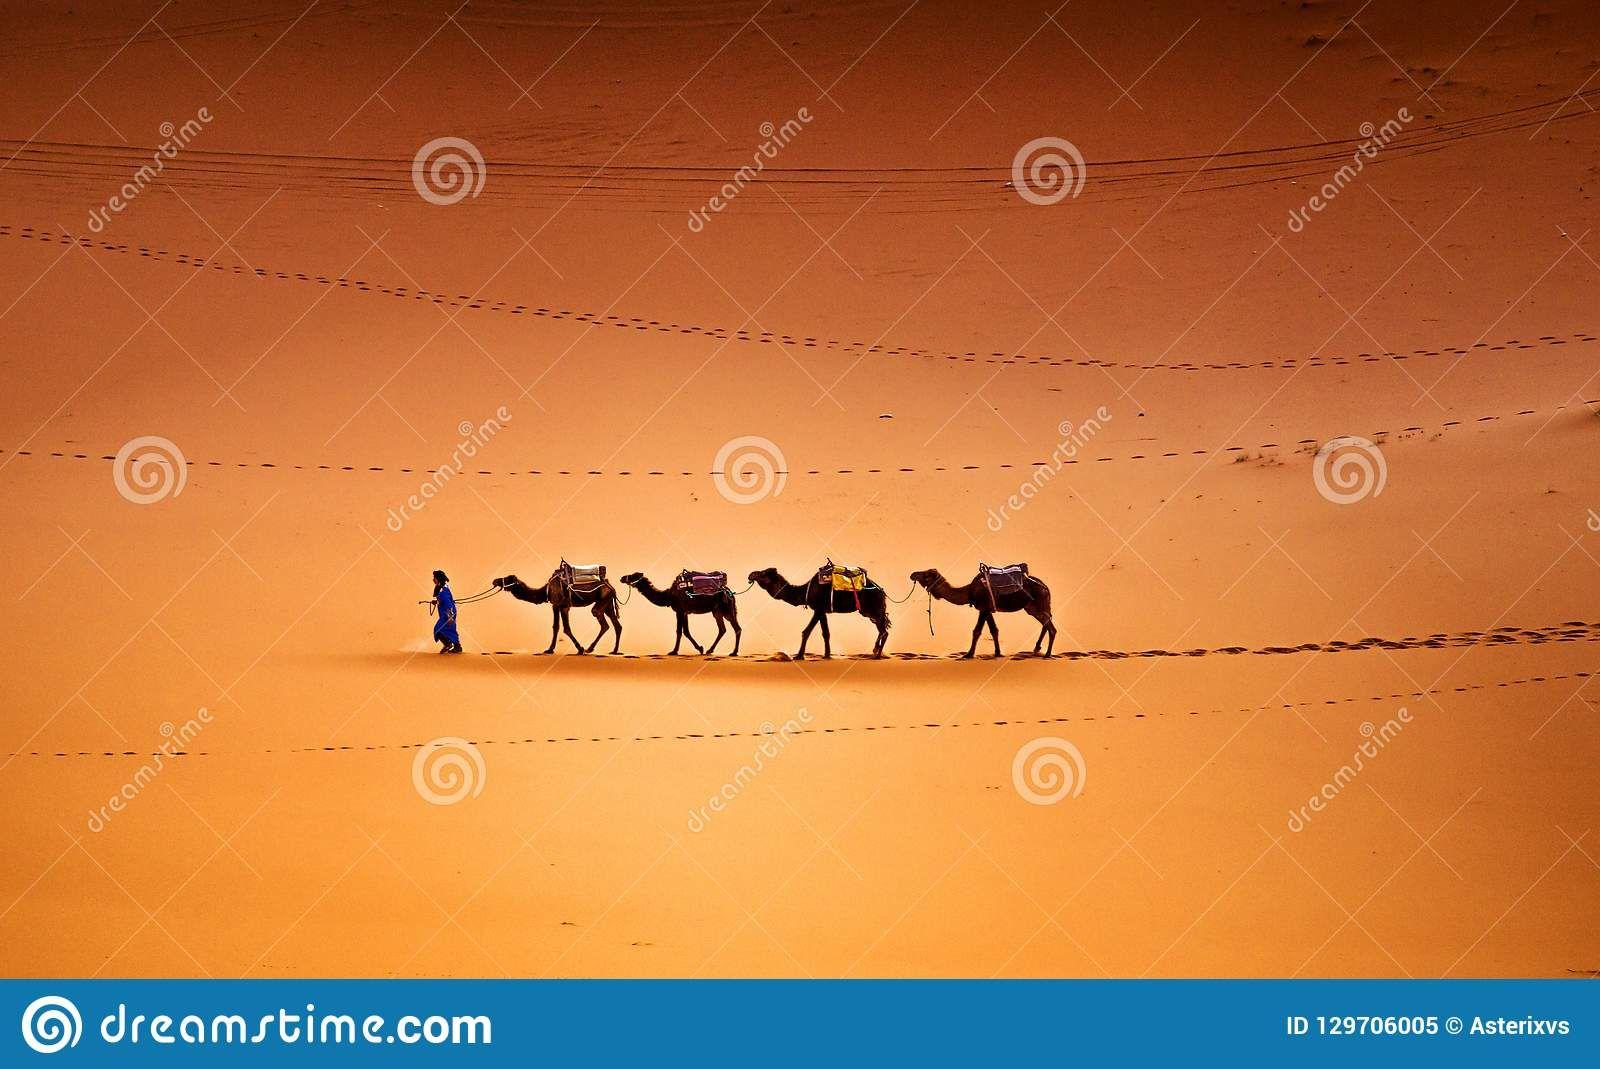 Camels Caravan In The Sahara Desert Morocco